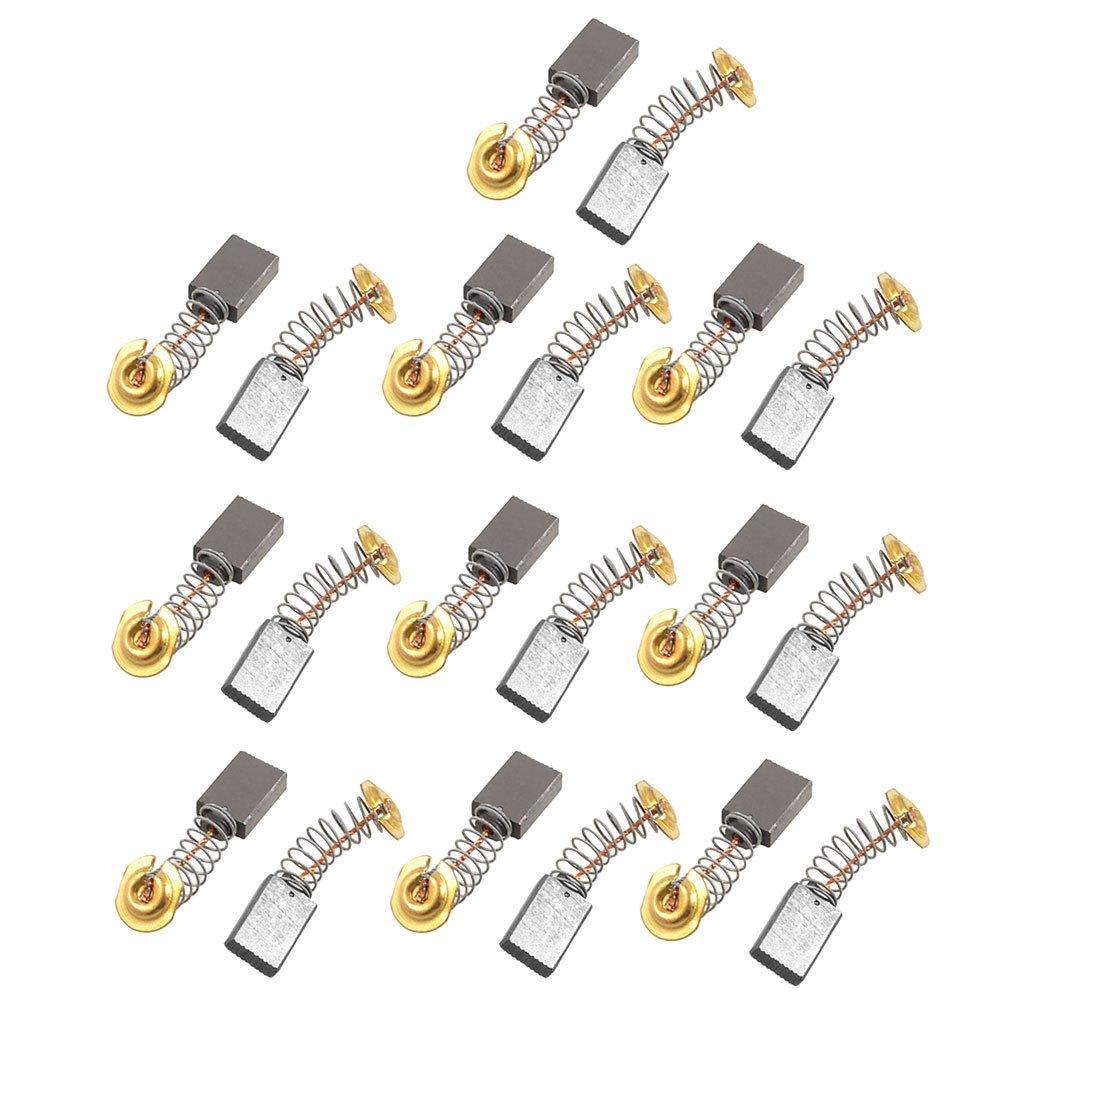 uxcell 20 Pcs CB303 0.59'' x 0.43'' x 0.19'' Carbon Brush for Makita Power Tool